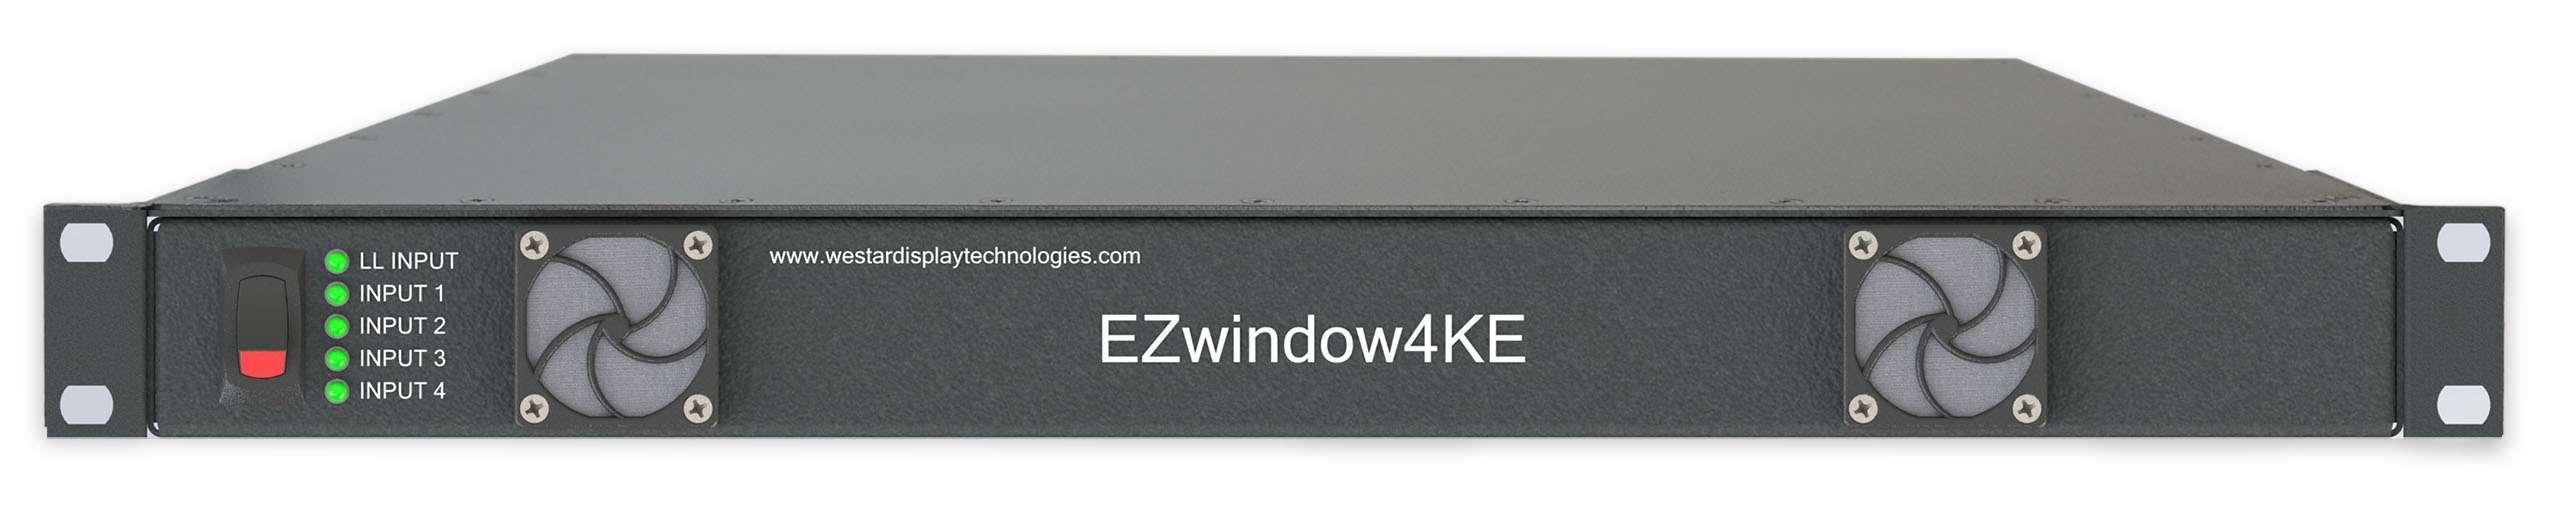 EZwindow4K 4K Ultra High Def Video Processor